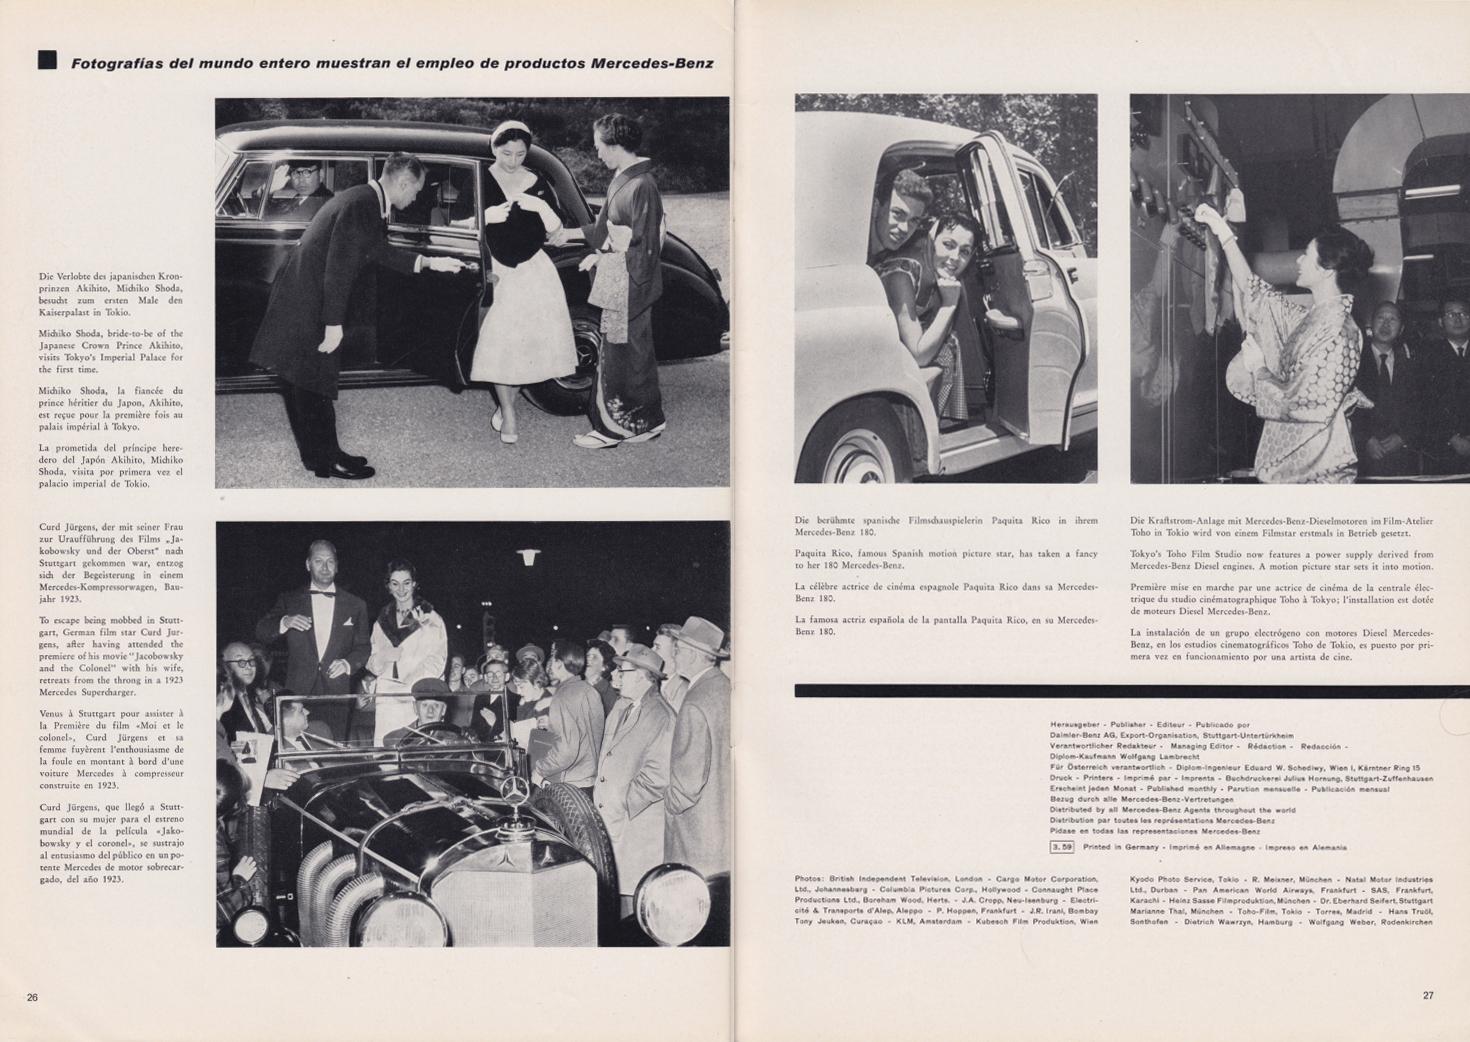 (REVISTA): Periódico In aller welt n.º 30 - Mercedes-Benz no mundo - 1959 - multilingue 014